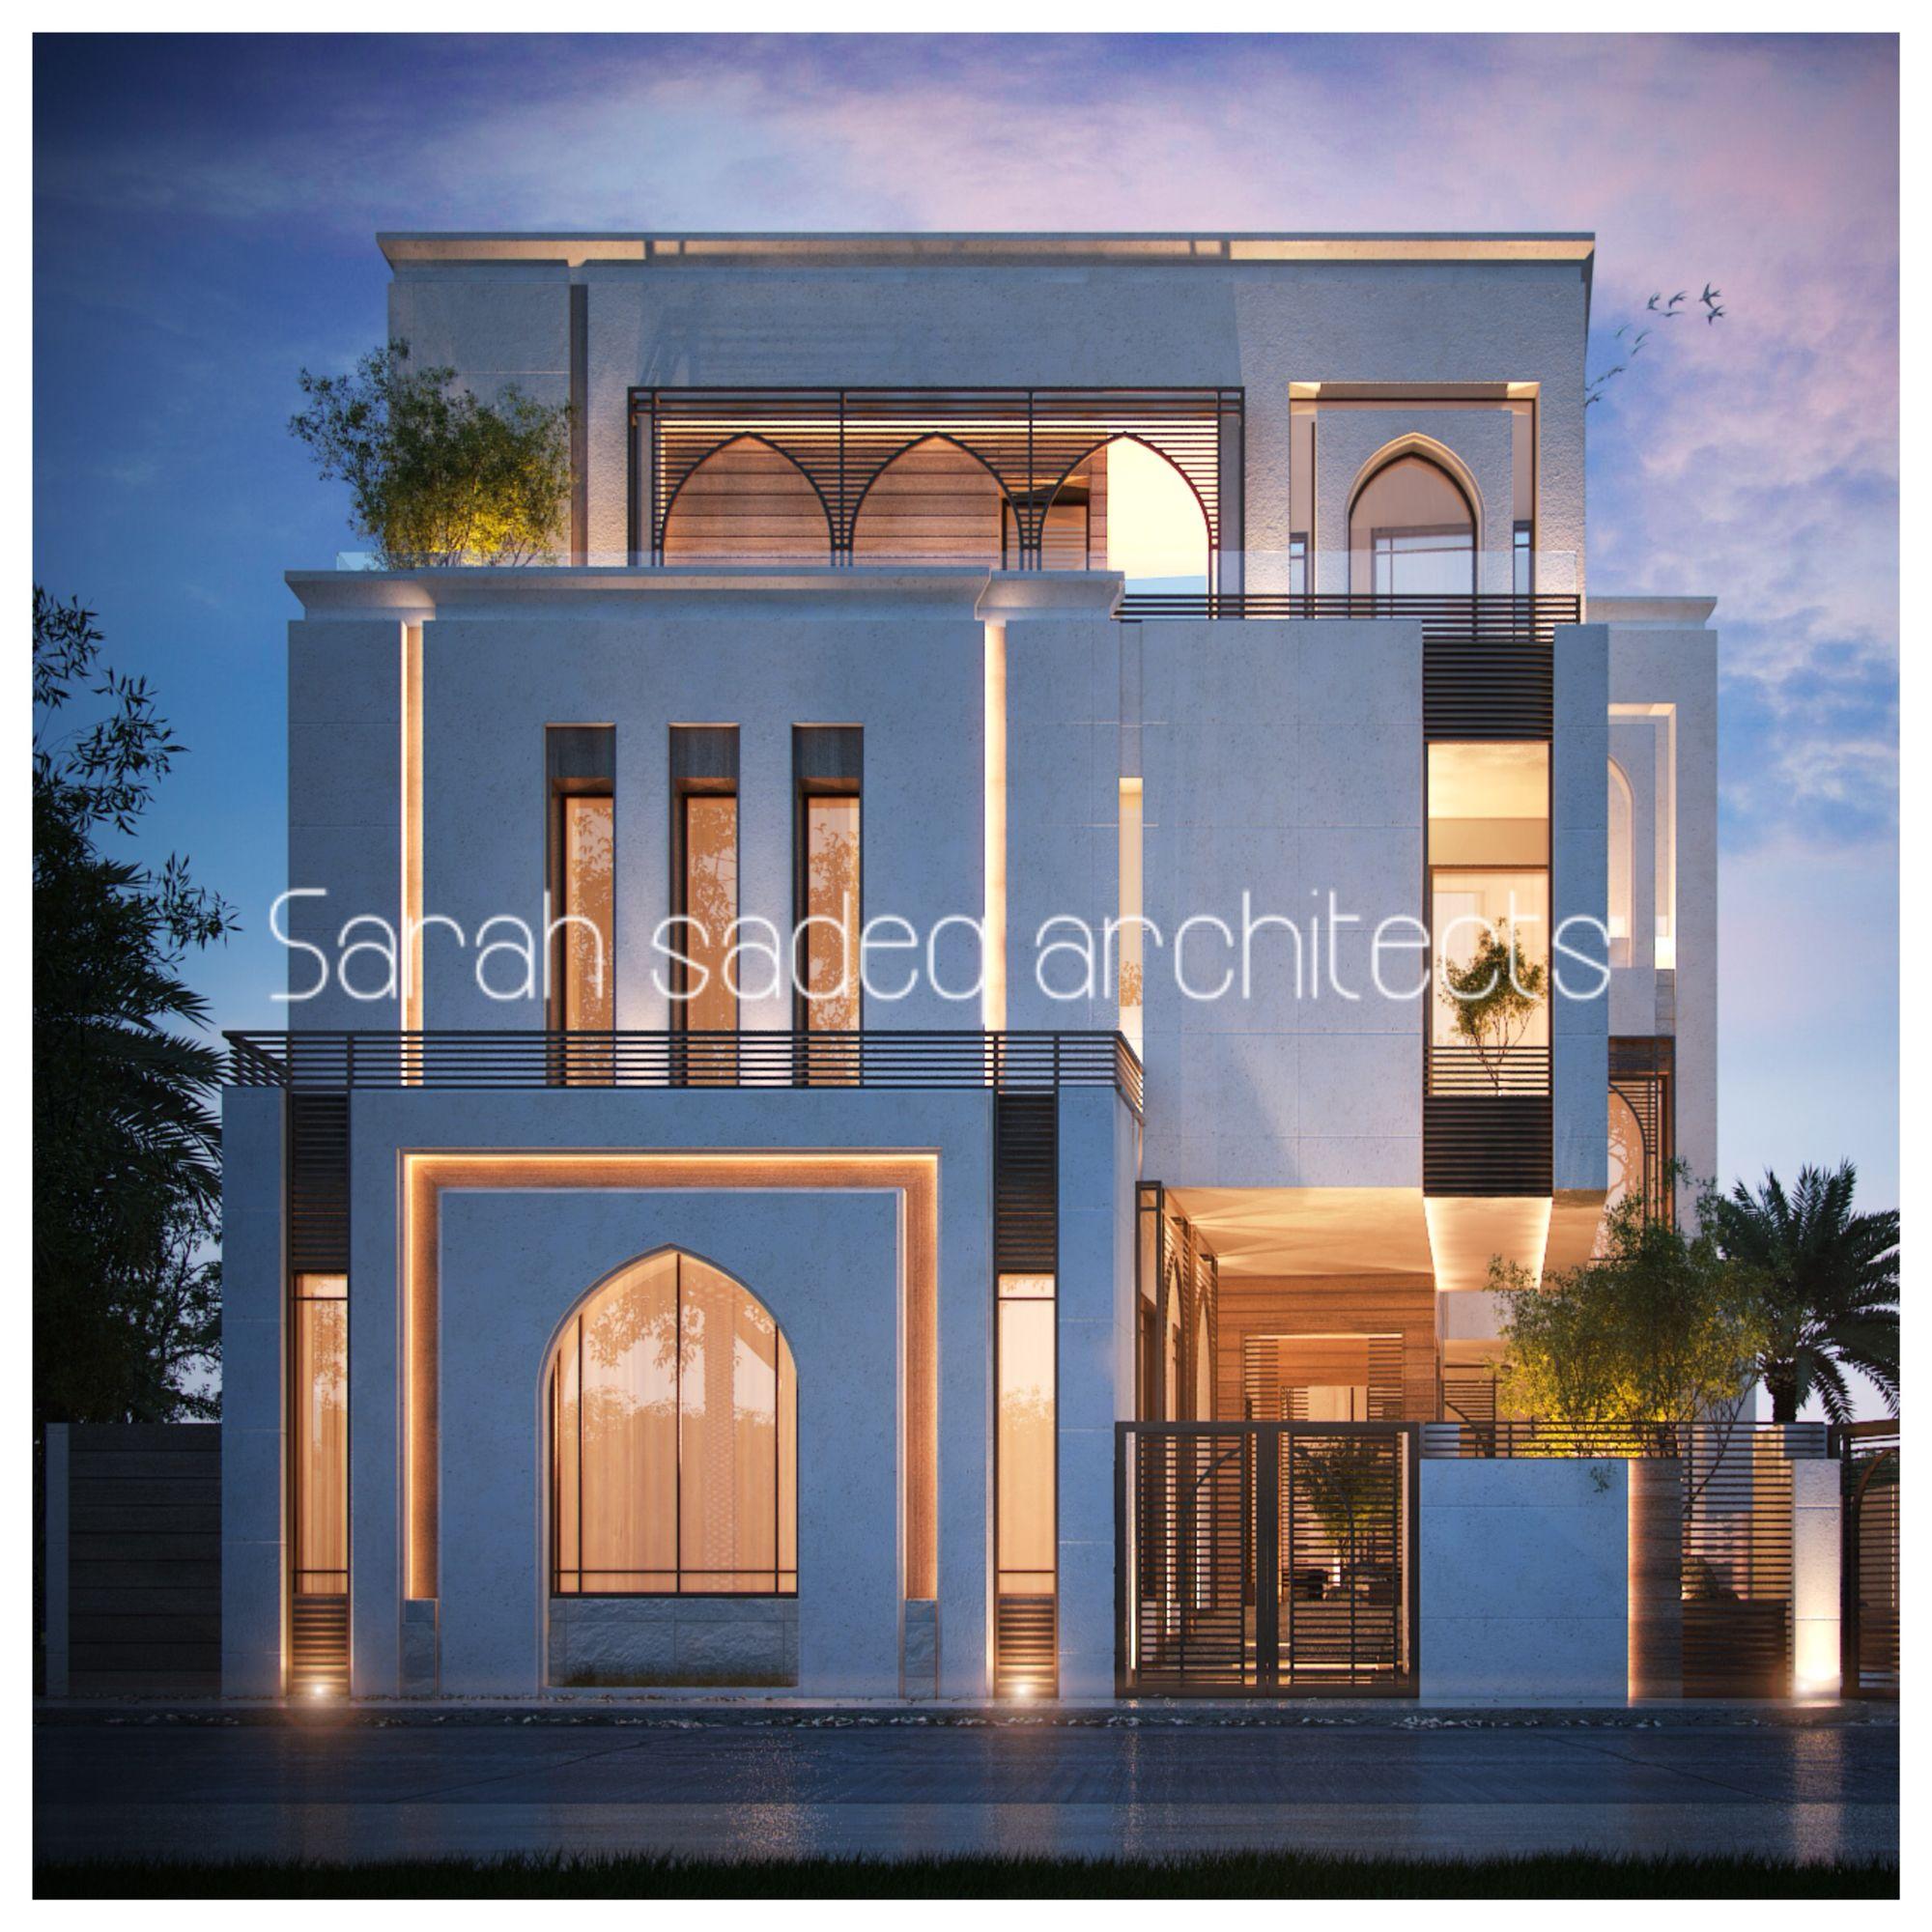 500 m private villa kuwait sarah sadeq architects for Construcciones de casas modernas